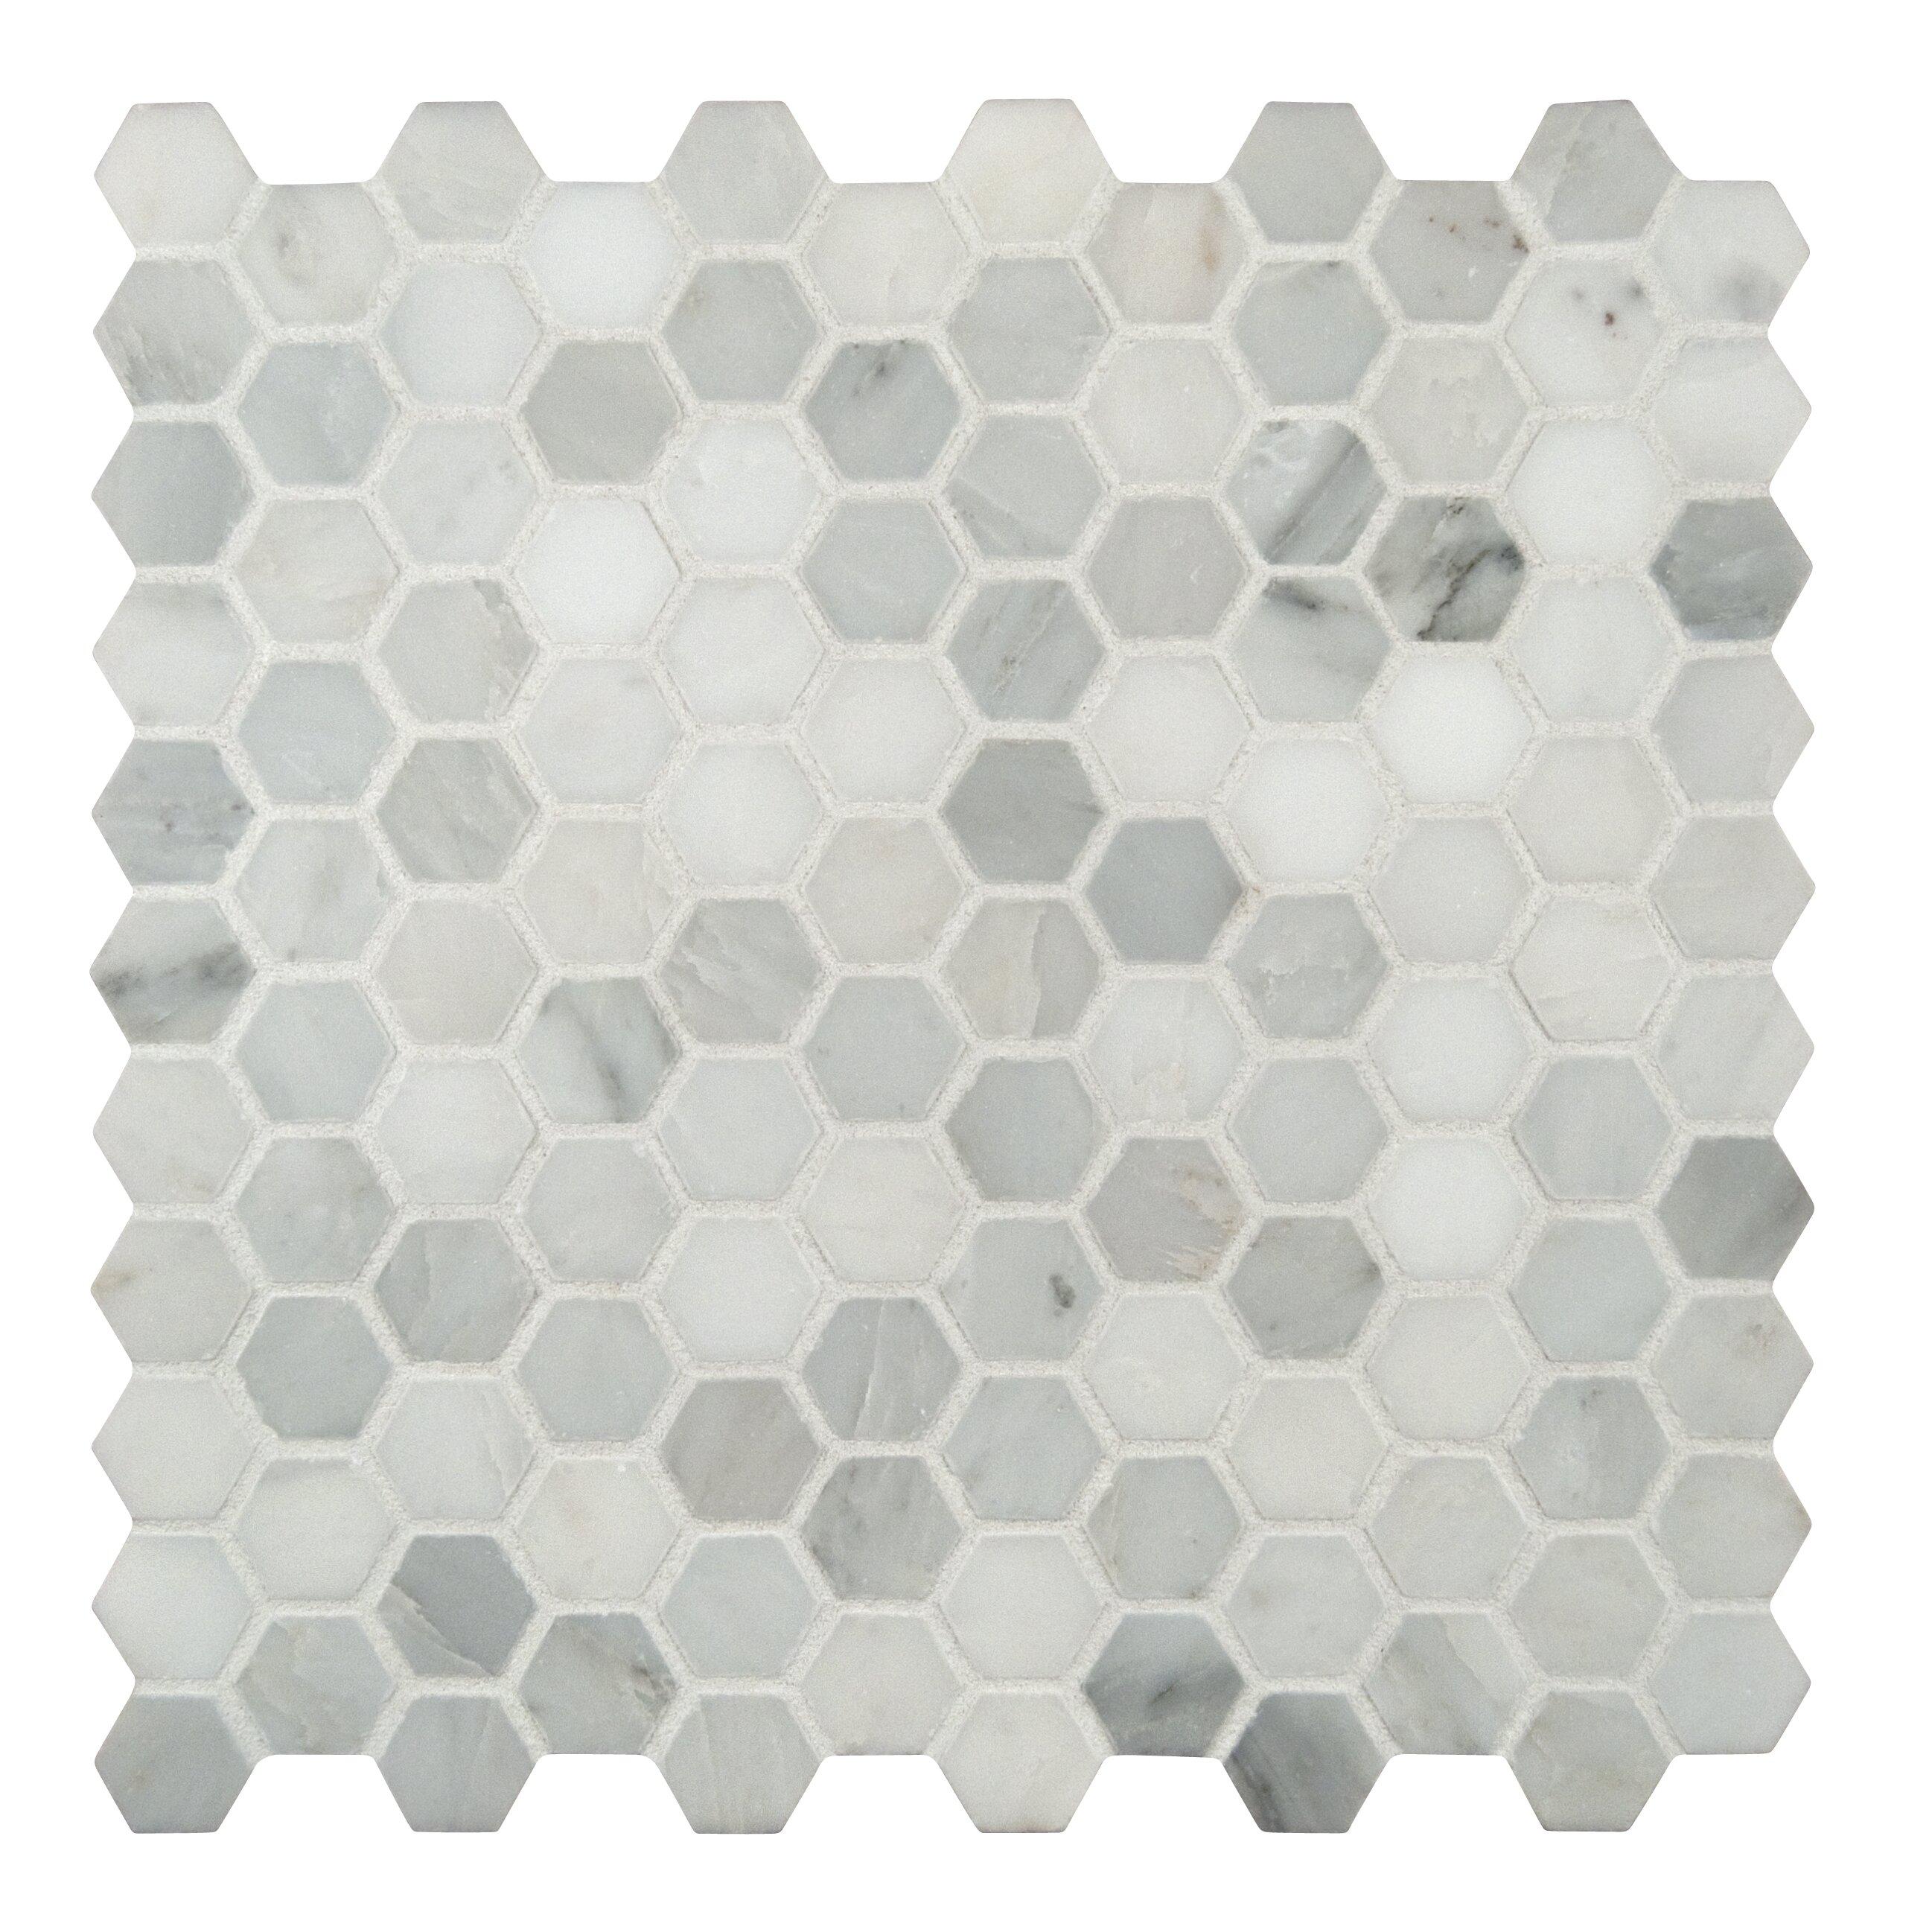 Marble Mosaic Tile Floor : Msi arabescato carrara quot hexagon dot marble mosaic